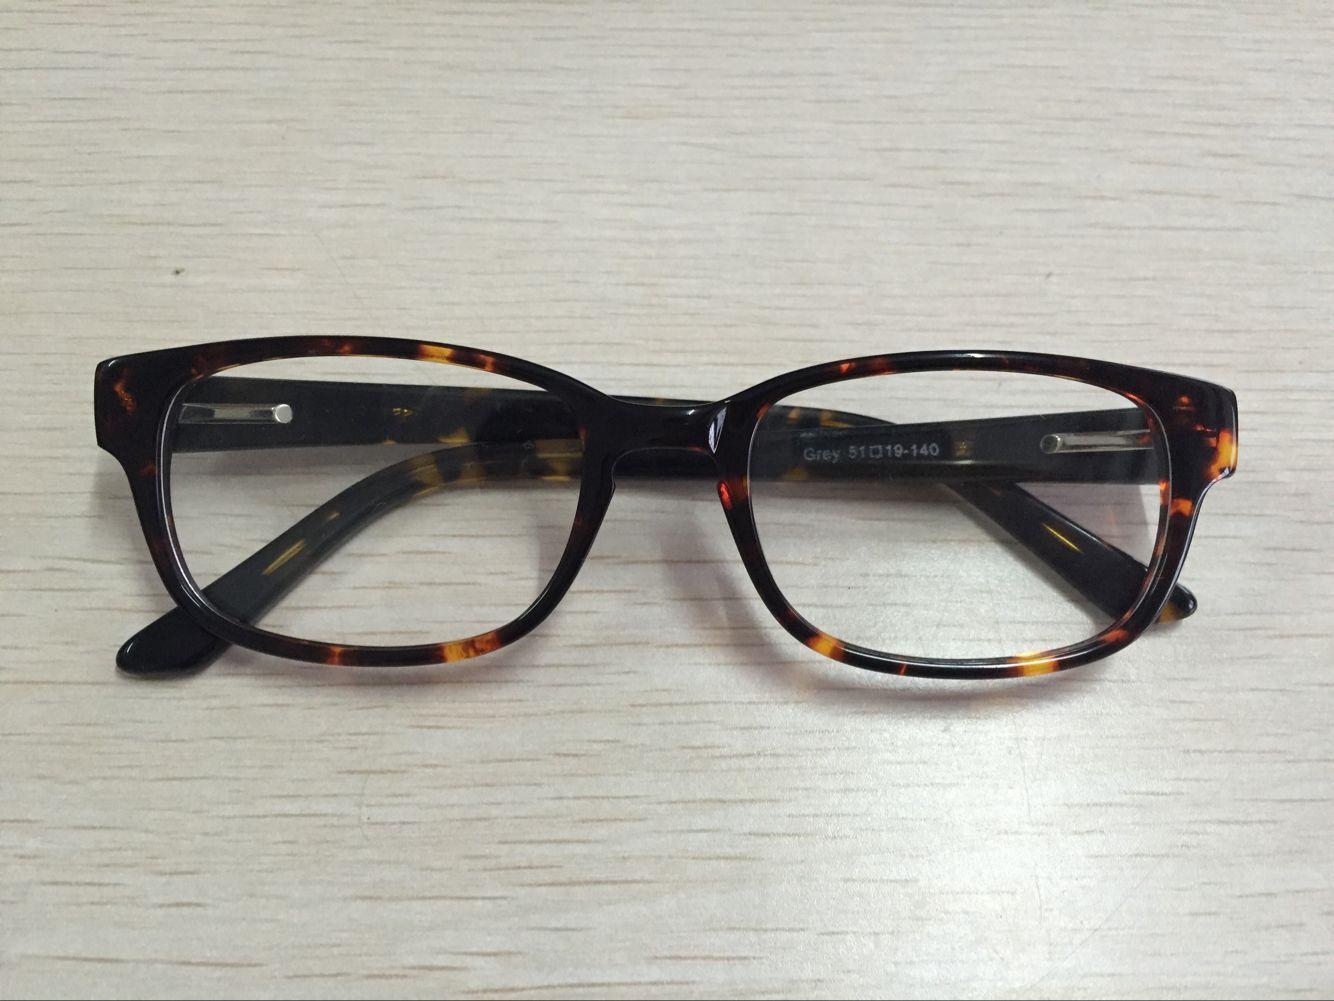 ca7cfc9f9be High Quality Vintage Glasses Frame For Men Women Acetate Square Prescription  Optical Eyeglasses Acetate Glasses Frame Optical Frames Acetate Acetate ...